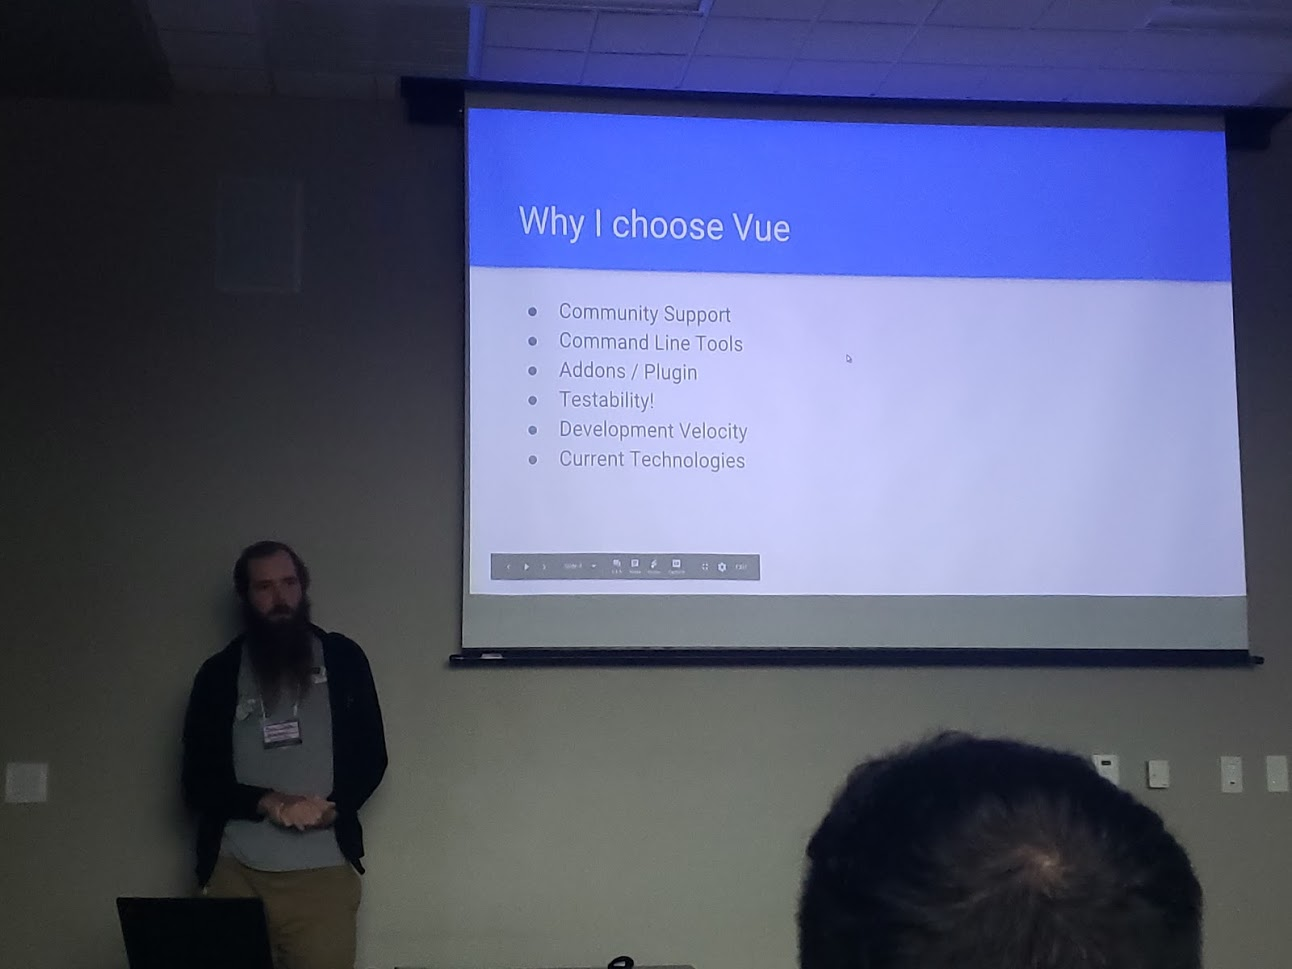 BarCamp 2019: Vue.js 2